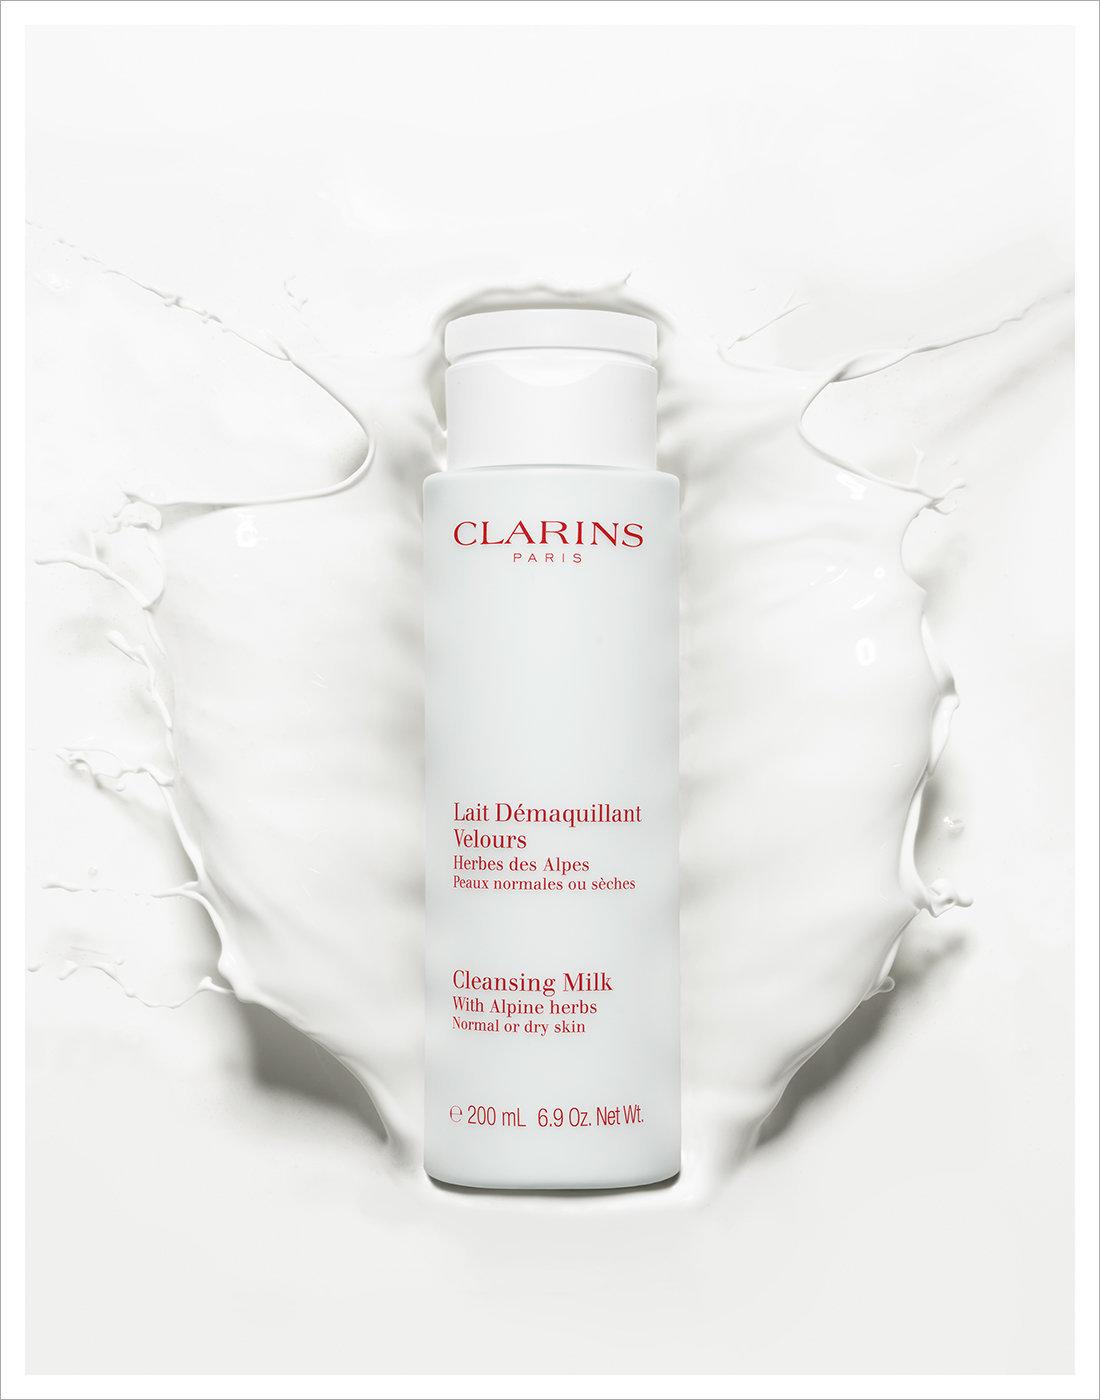 239_CLARINS_CleansingMilk8829_v2_11X14_lr.jpg